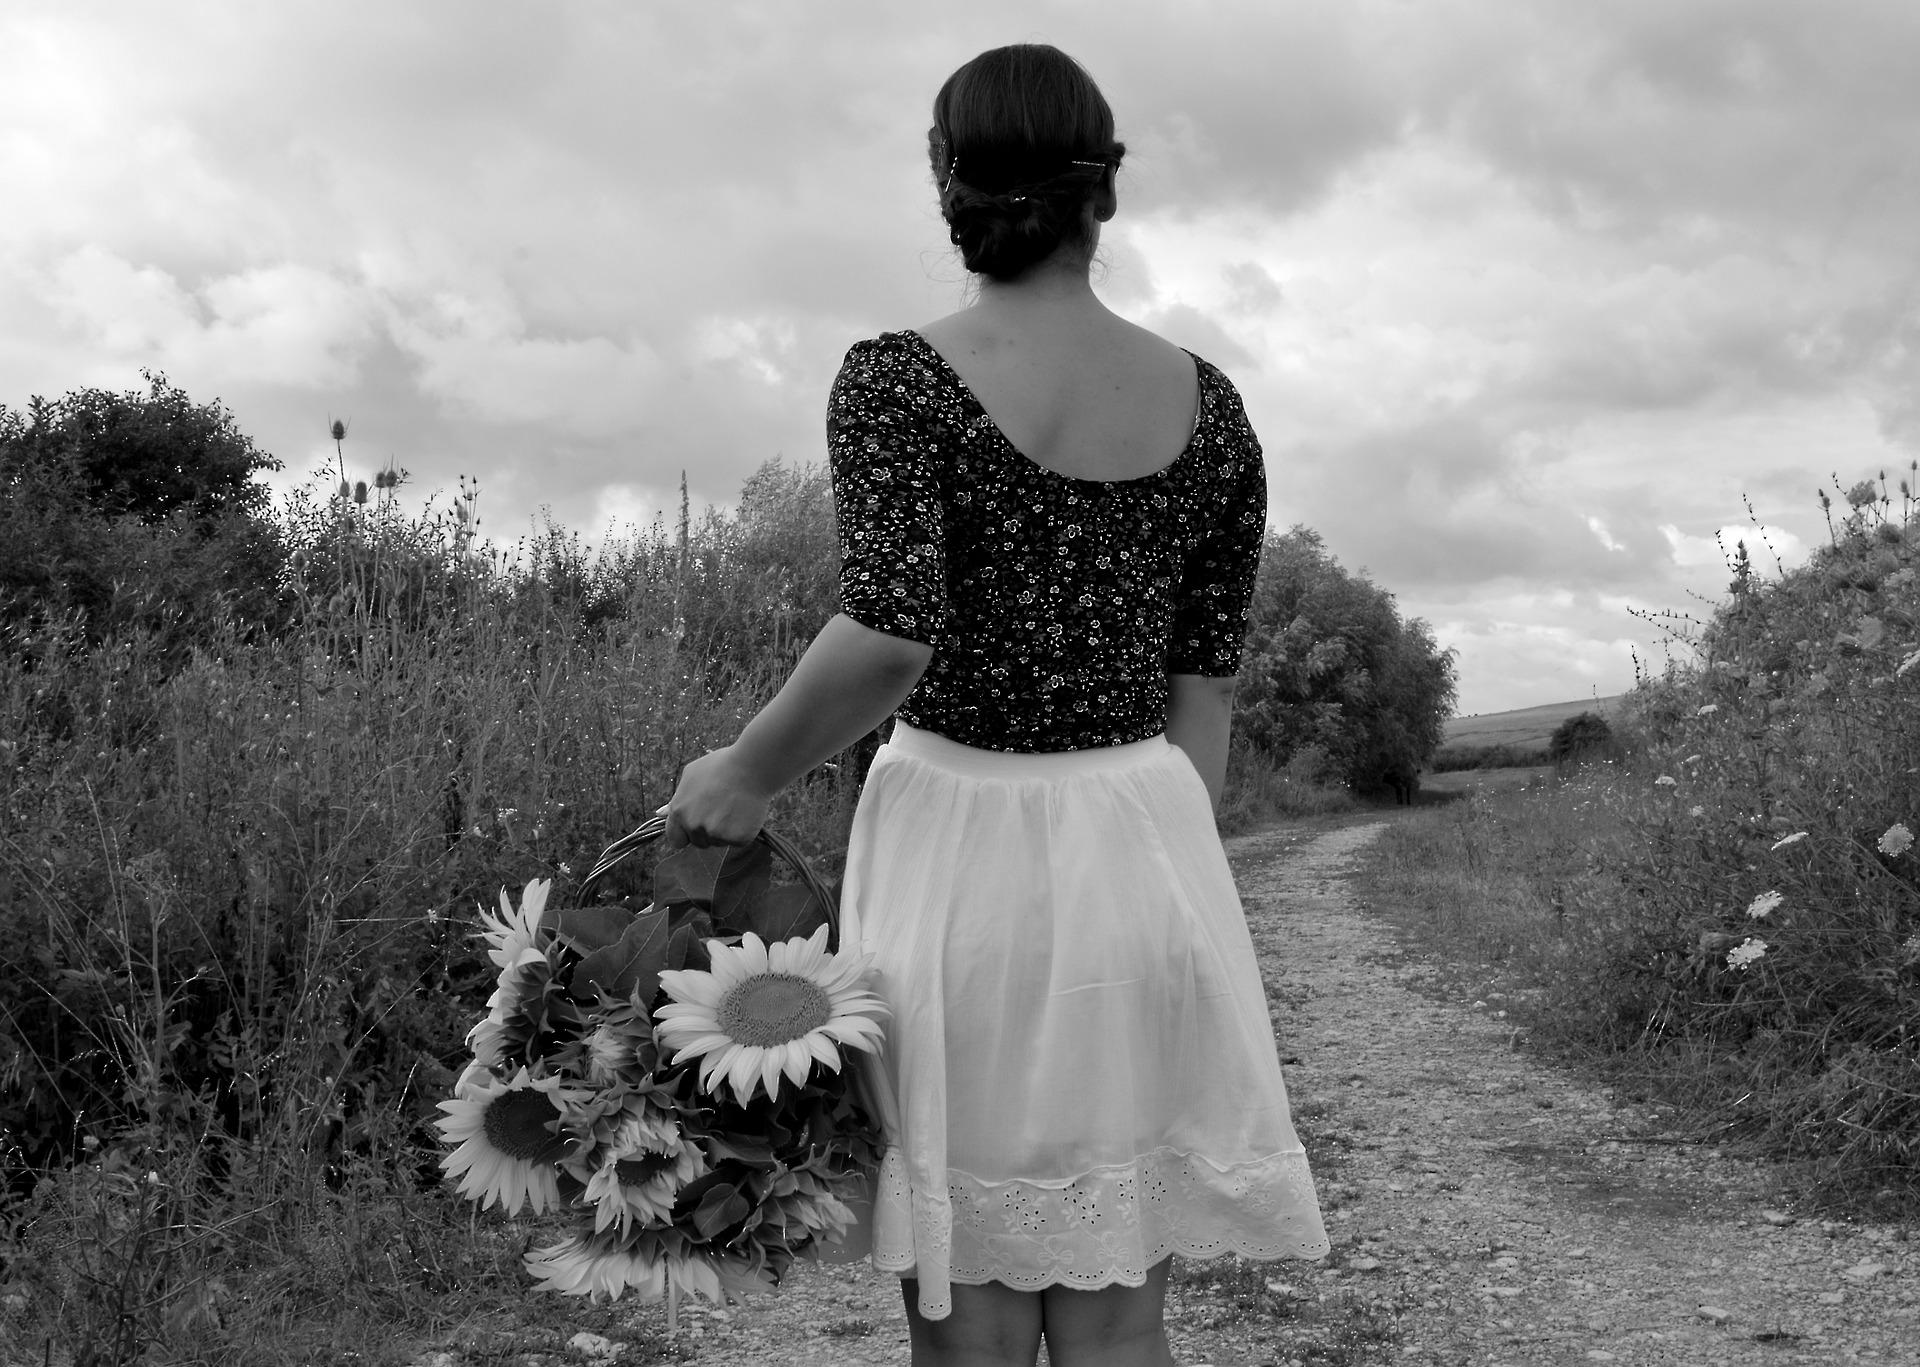 black-and-white-1526025_1920.jpg